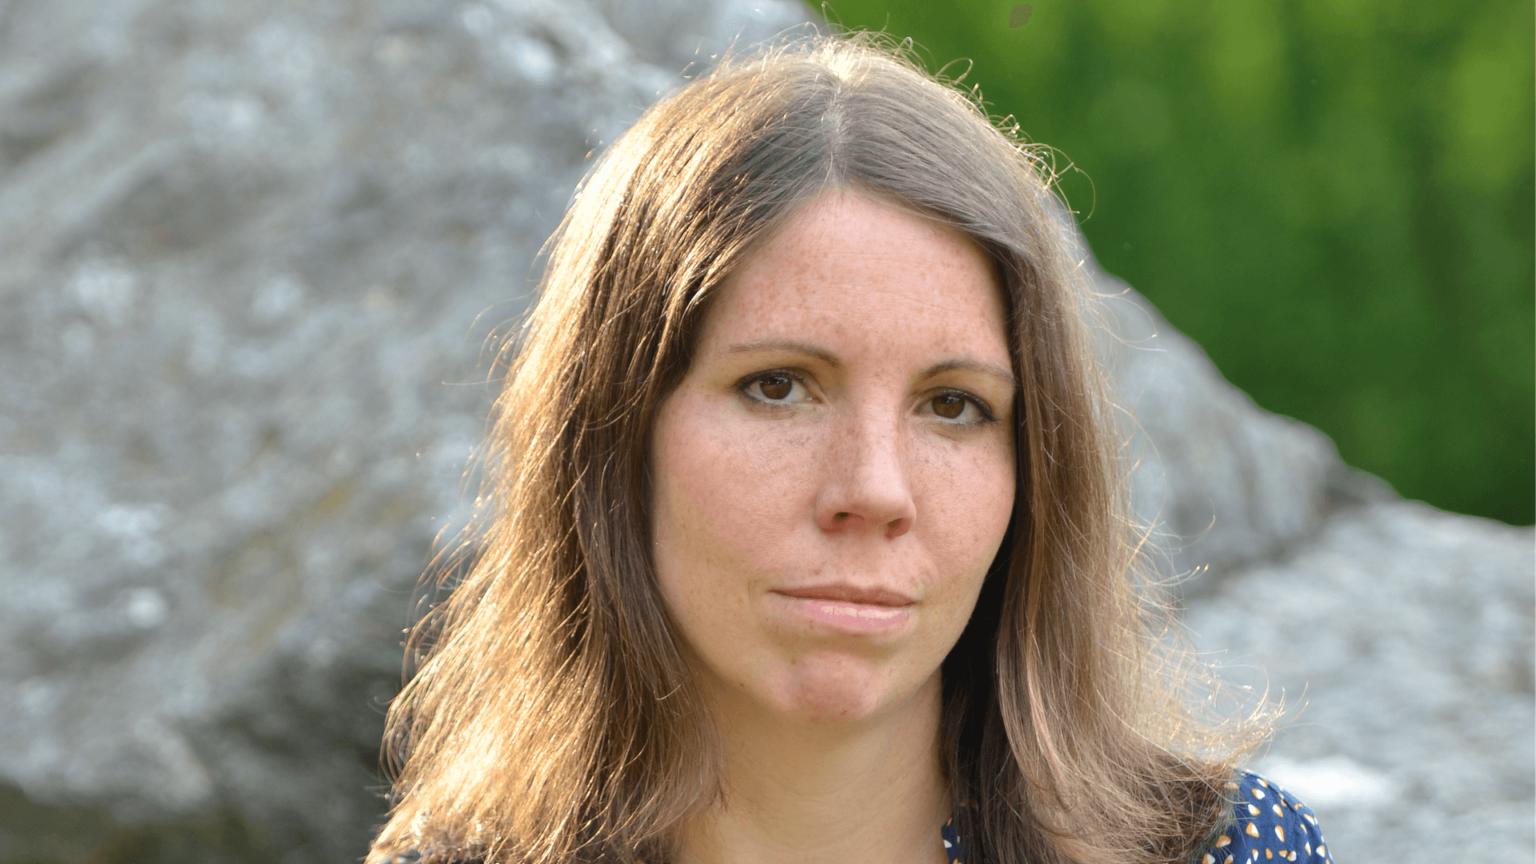 Šárka Mitlöhner